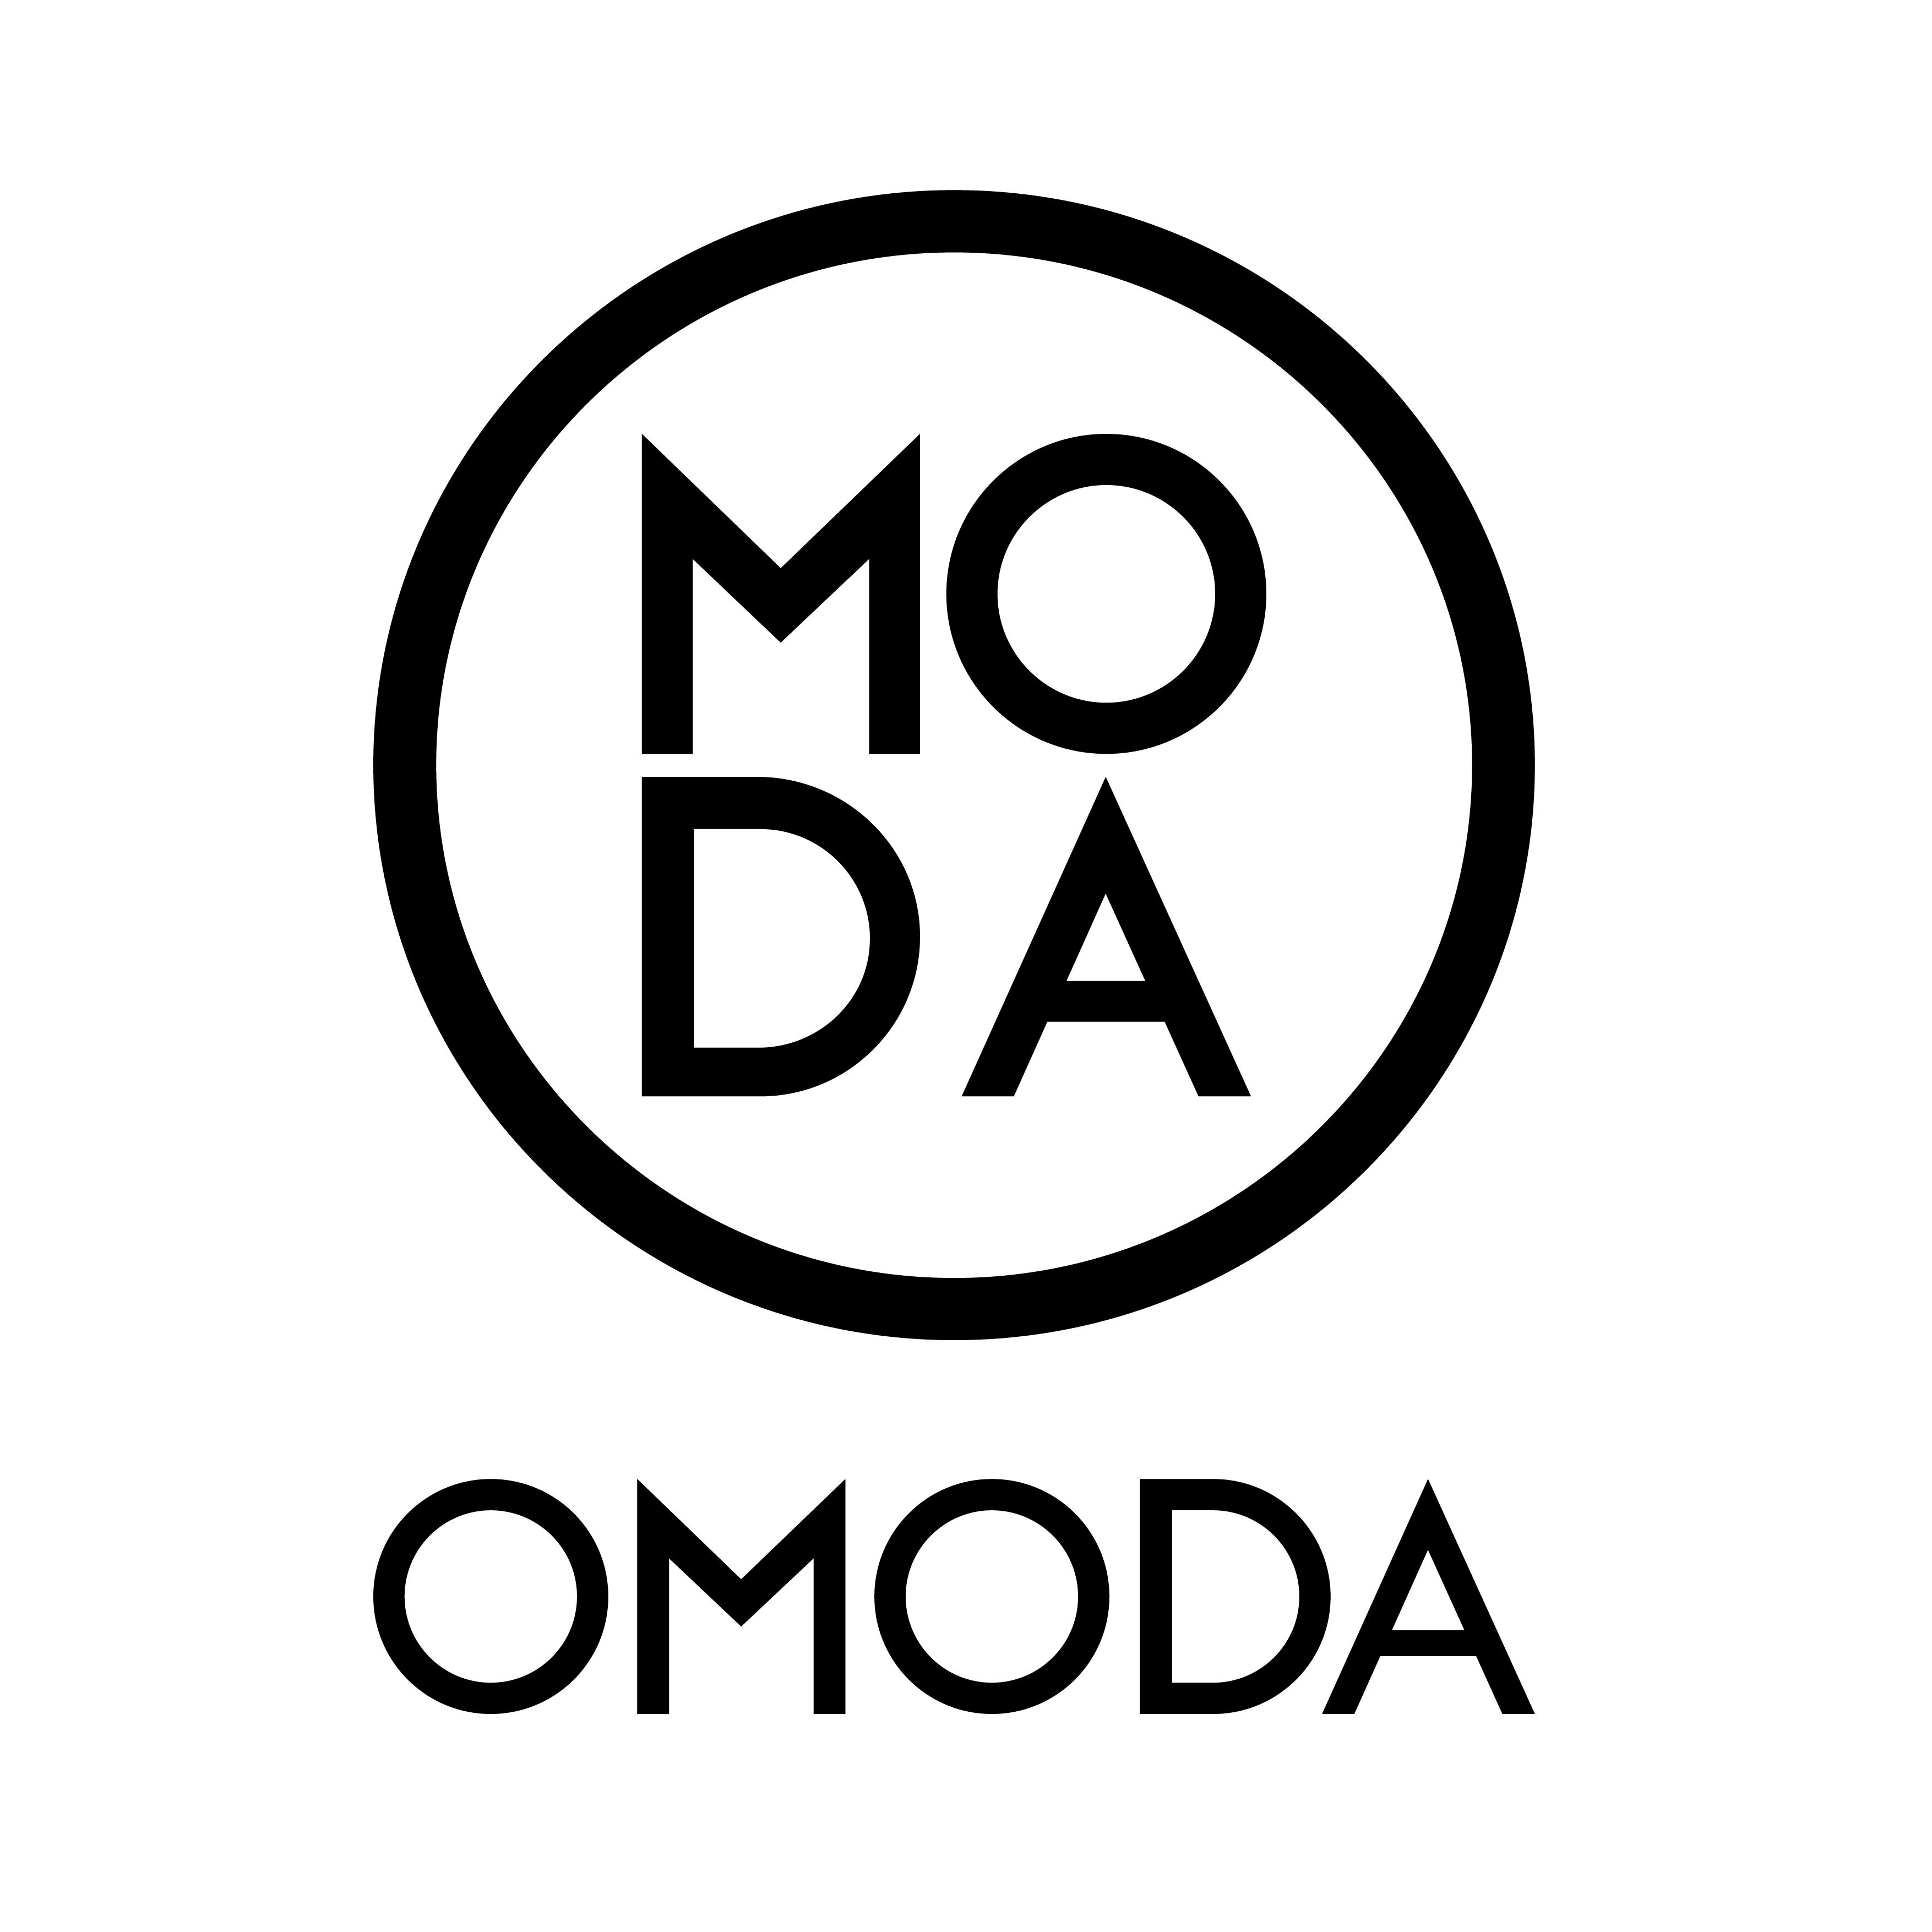 1bbf29d1b52 Schoenen, tassen en accessoires online bestellen - Omoda.nl